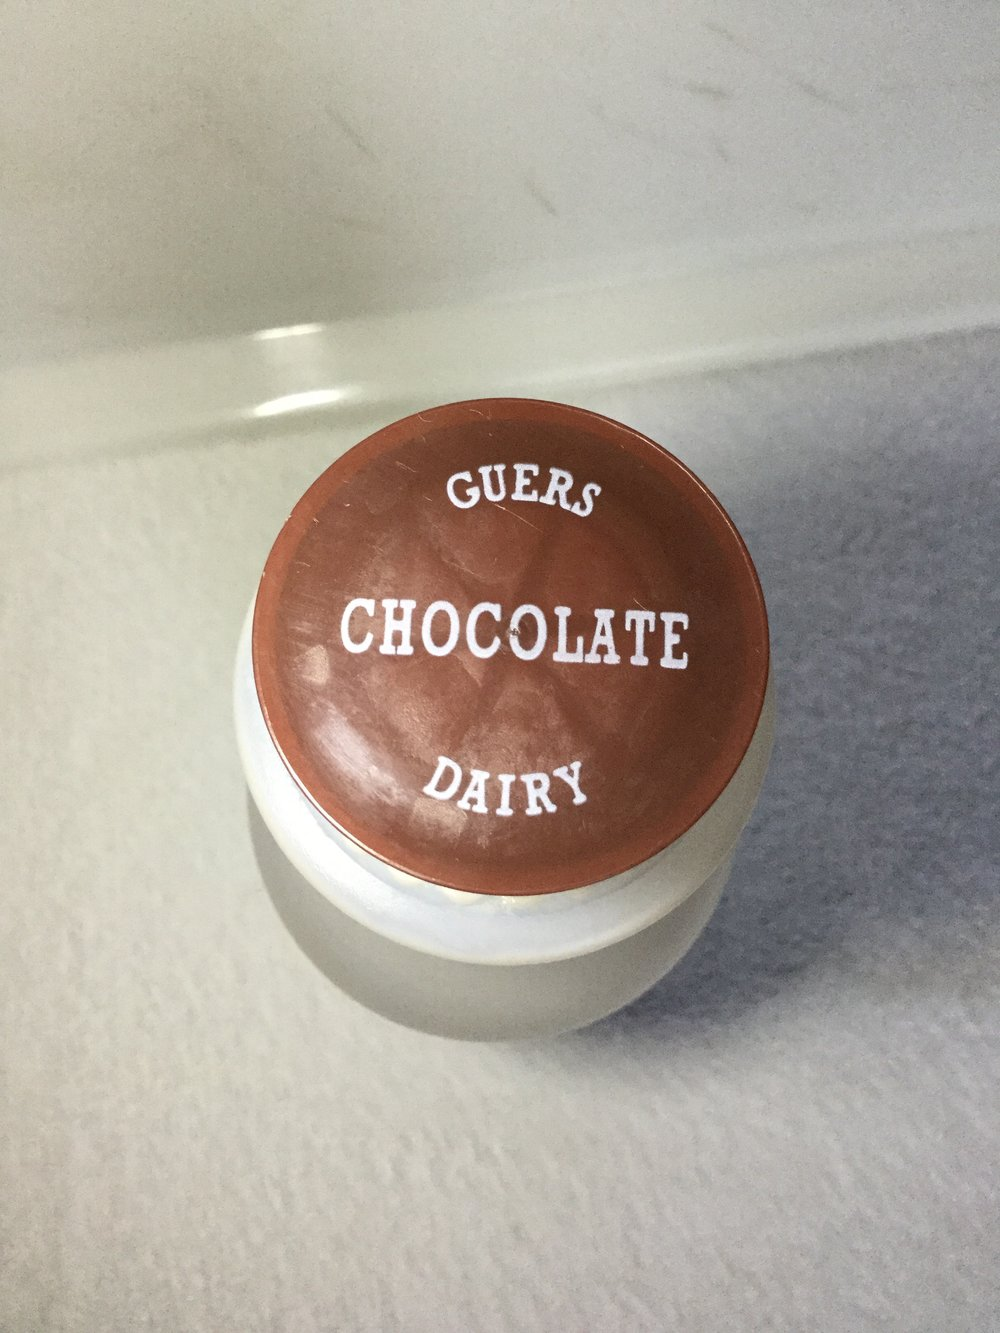 Guers Tumbling Run Dairy Chocolate Milk Top